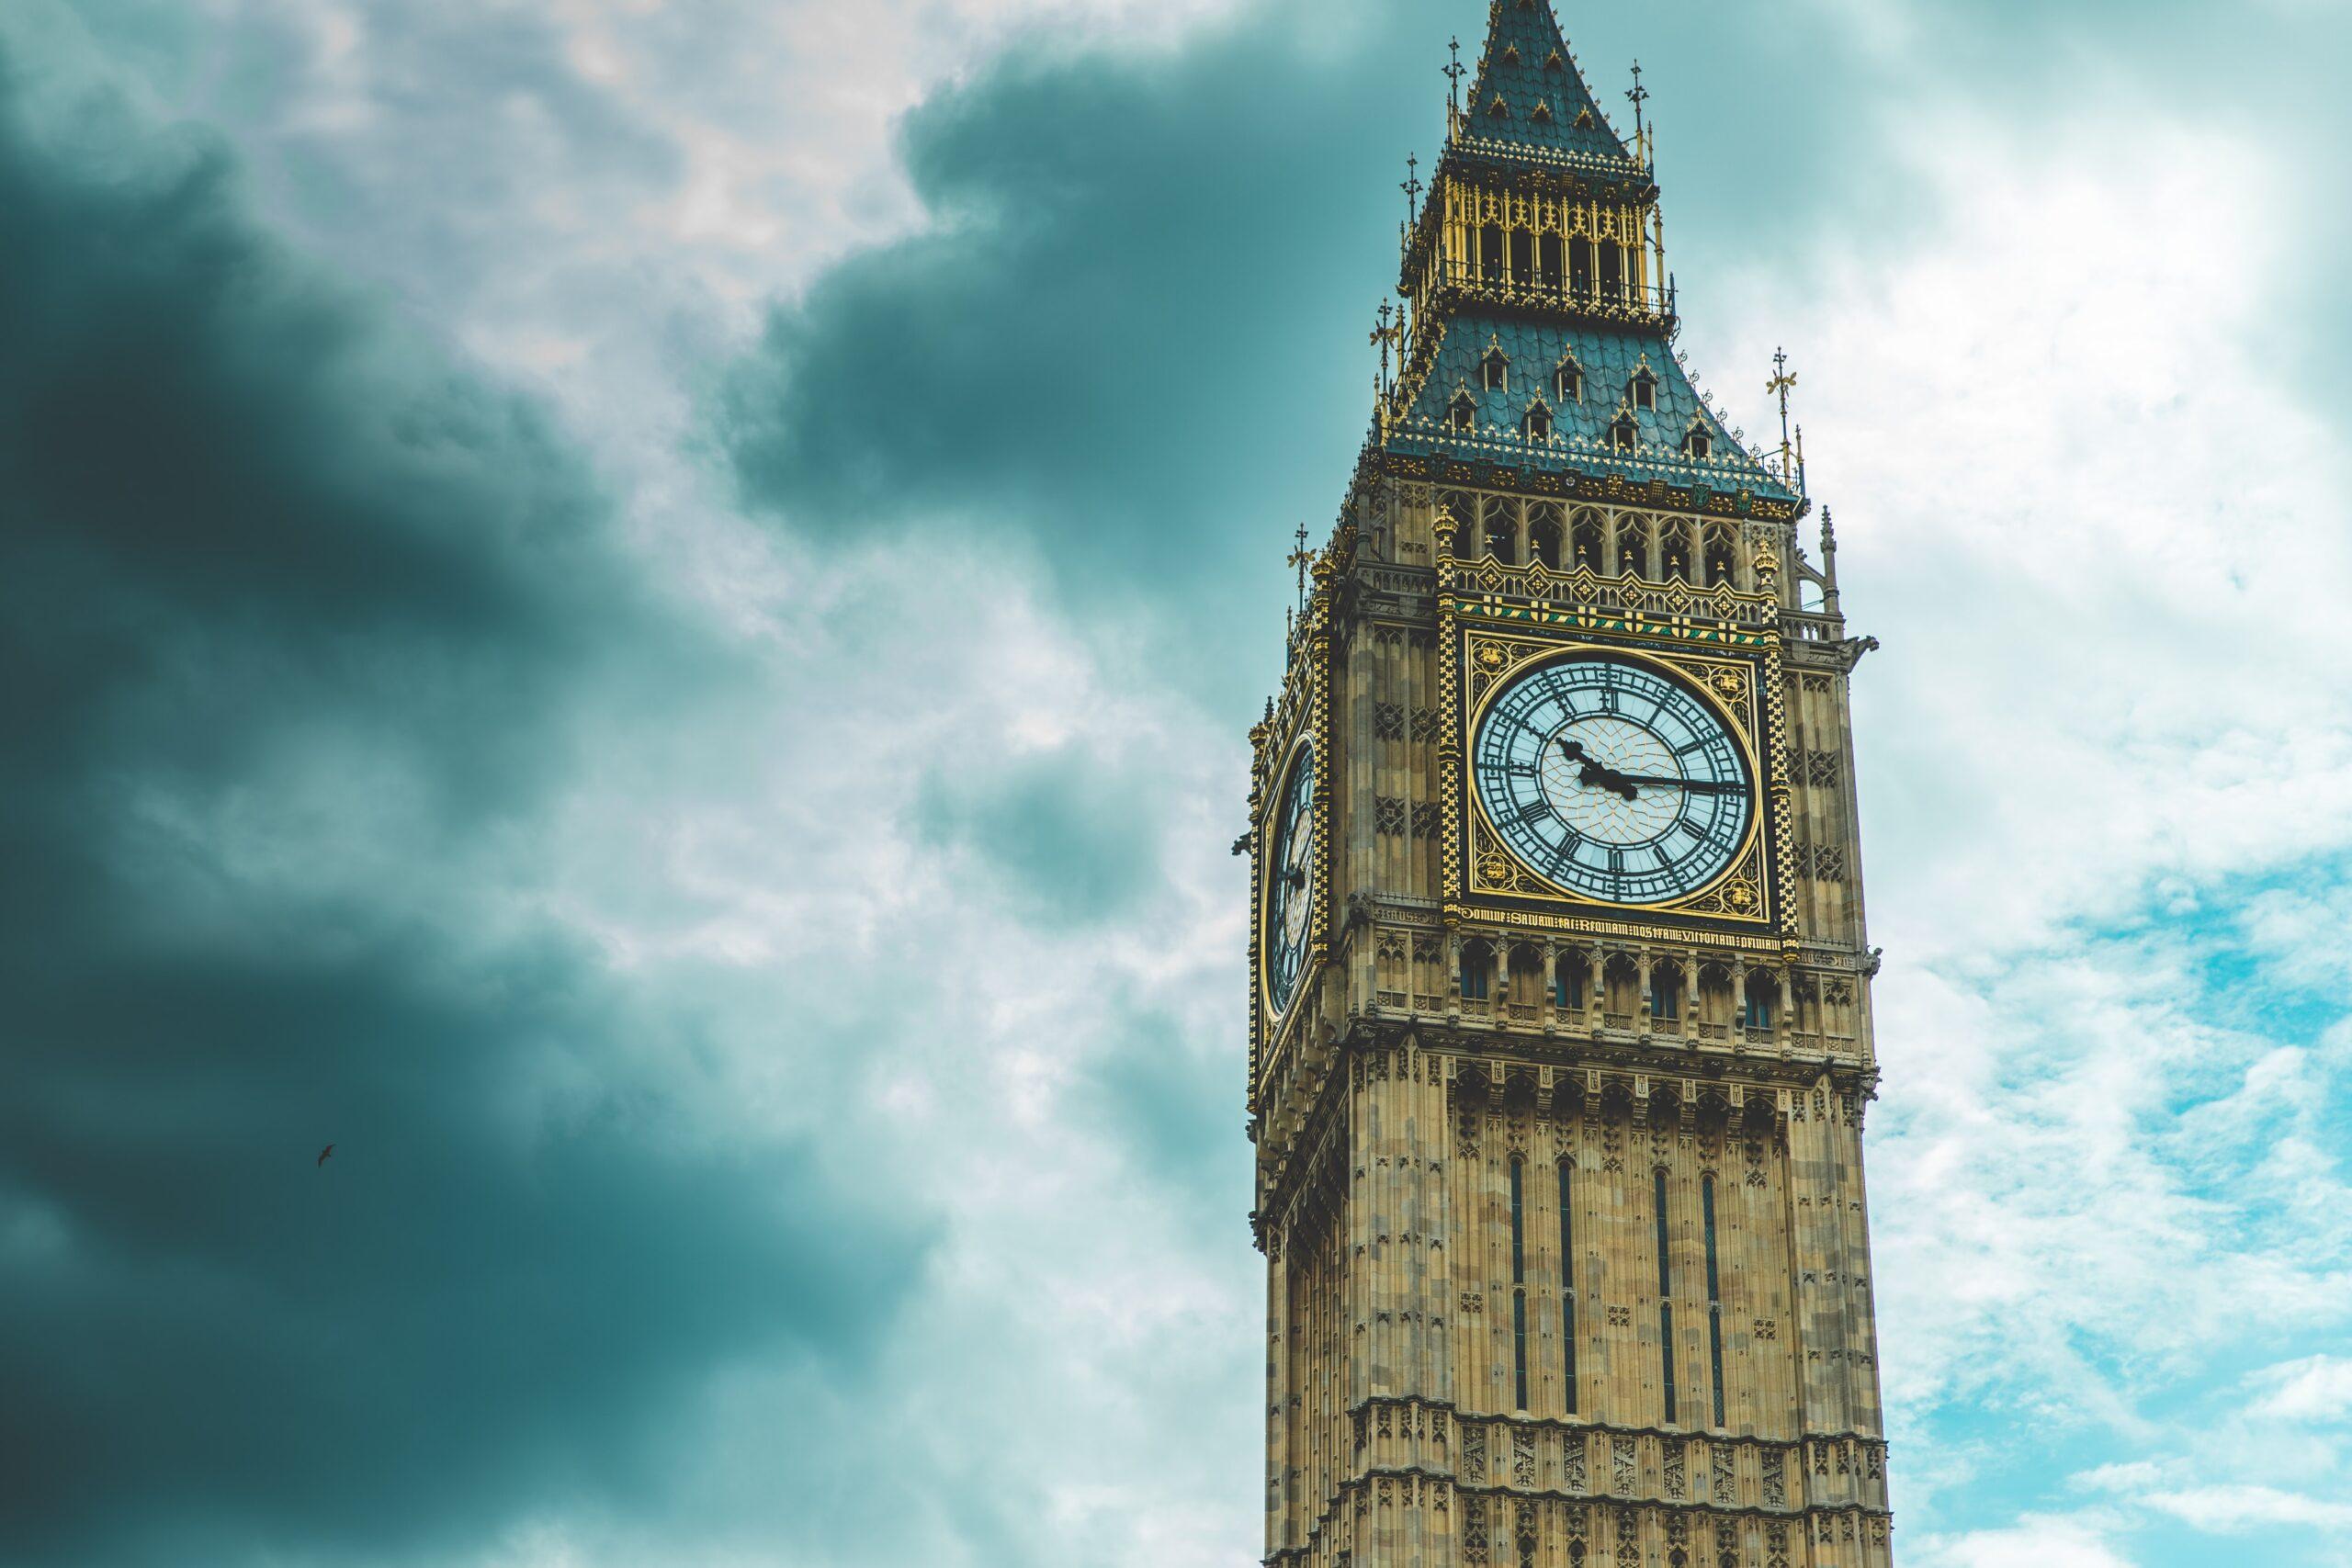 immigration consultation - elizabeth tower